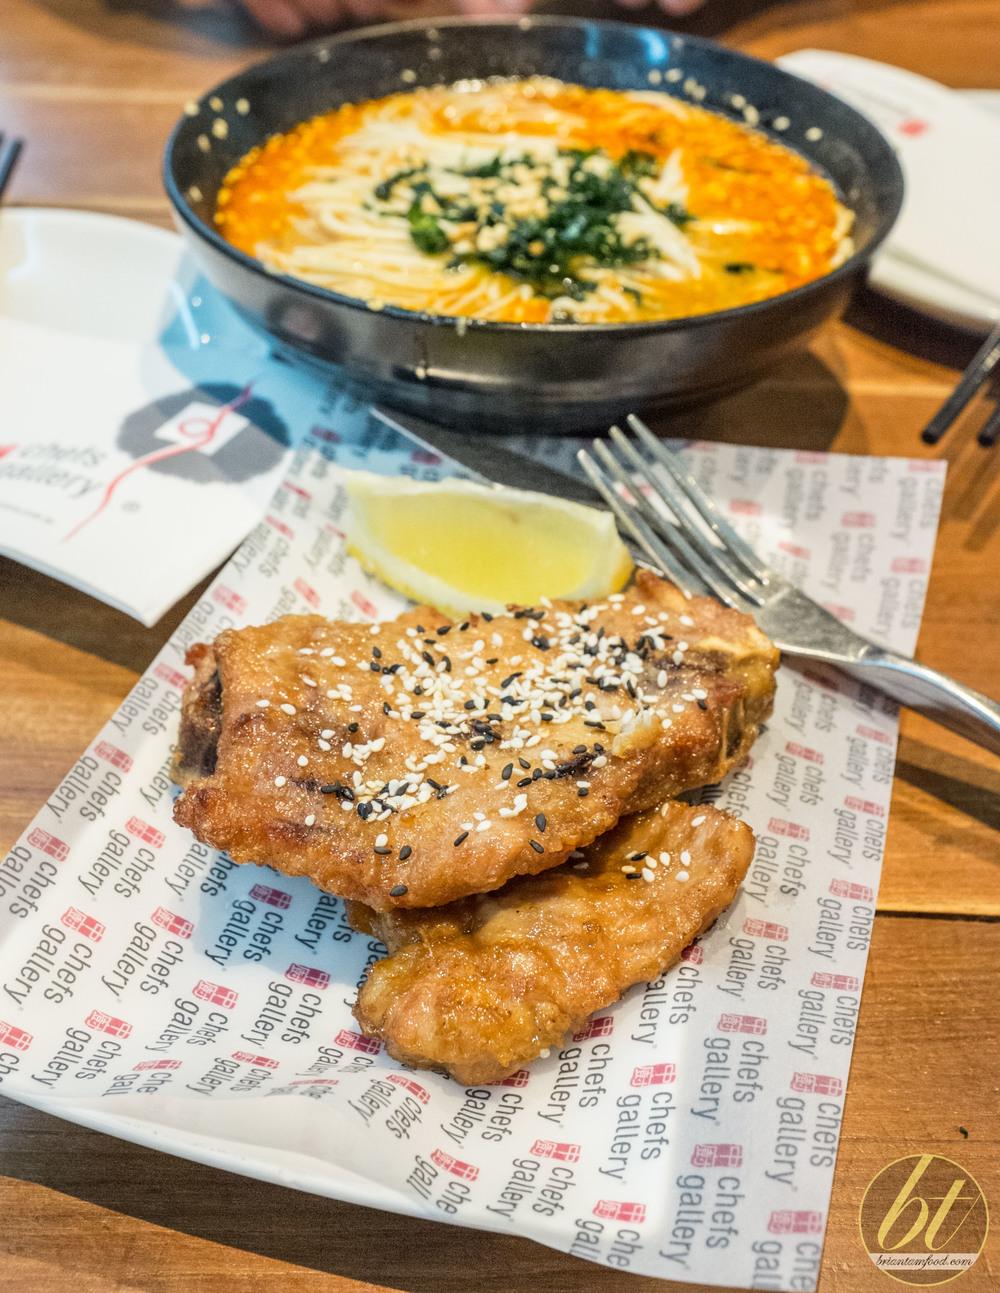 Chef's Gallery Sydney Dan Dan Noodles